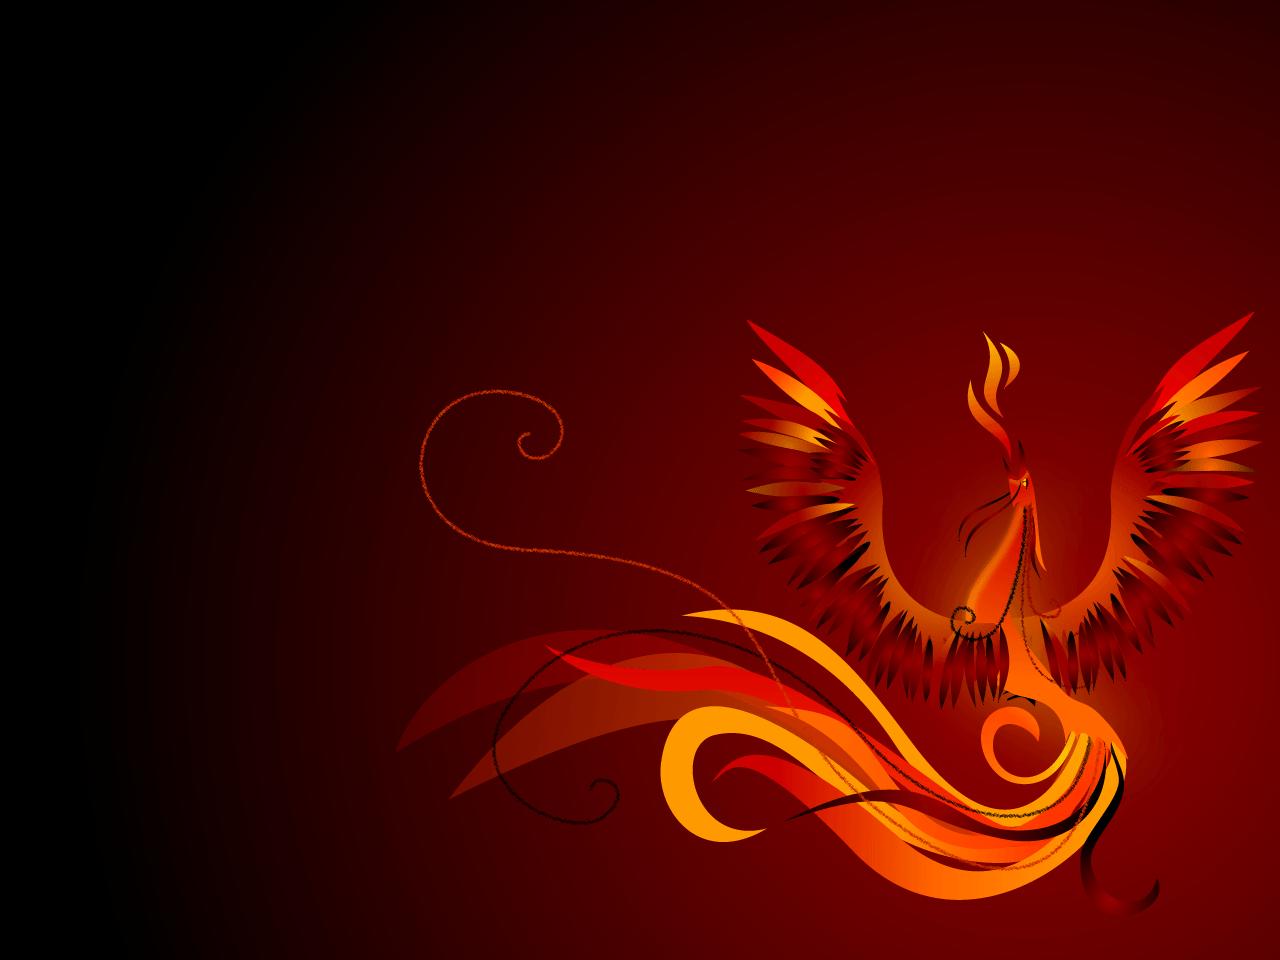 phoenix iphone wallpaper - photo #40